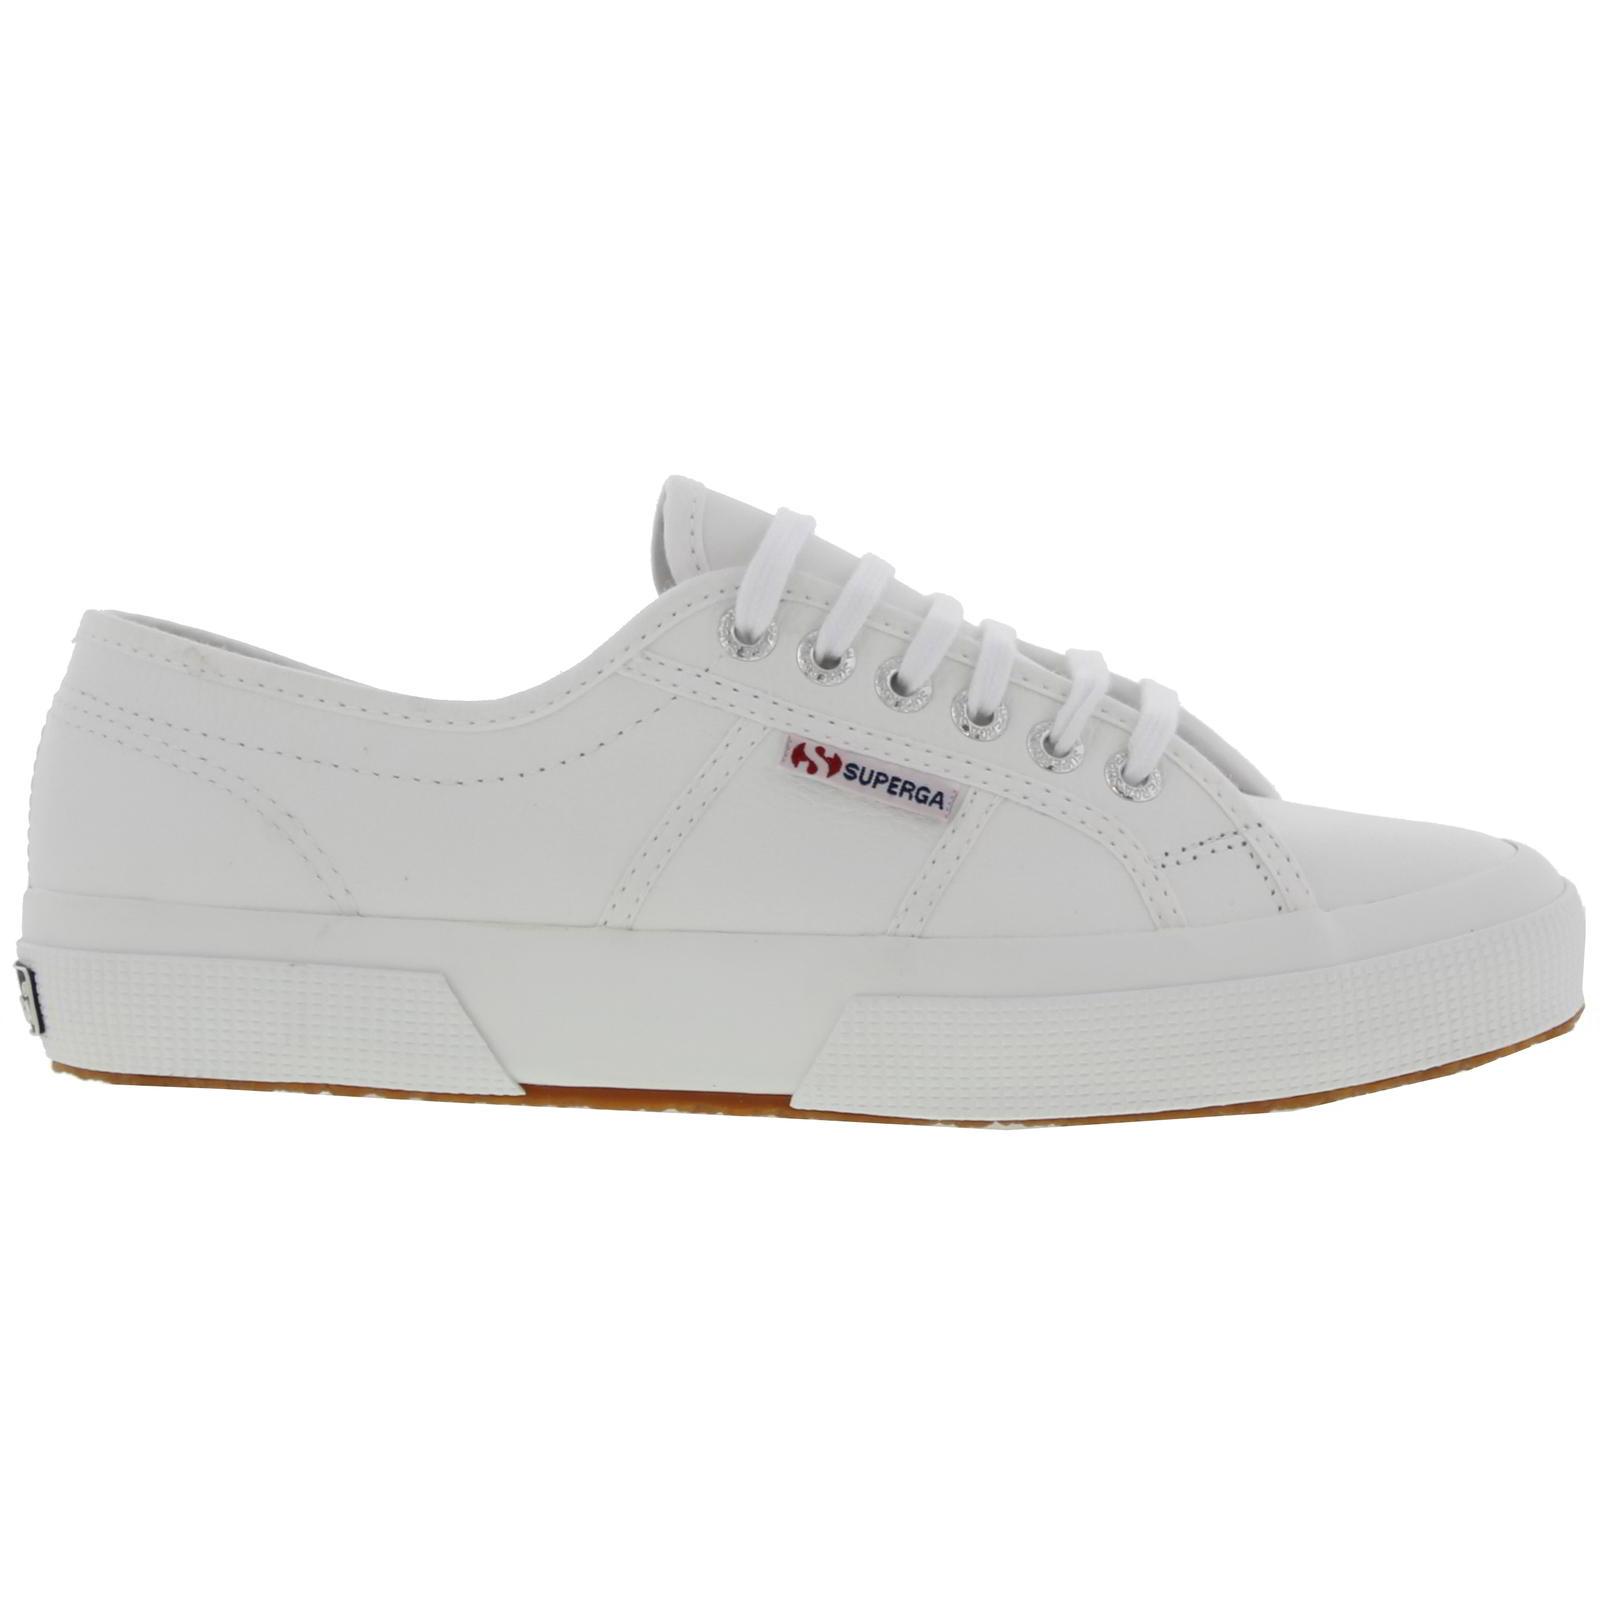 Superga Womens 2750 Cotu EFGLU Leather Trainers Shoes - White